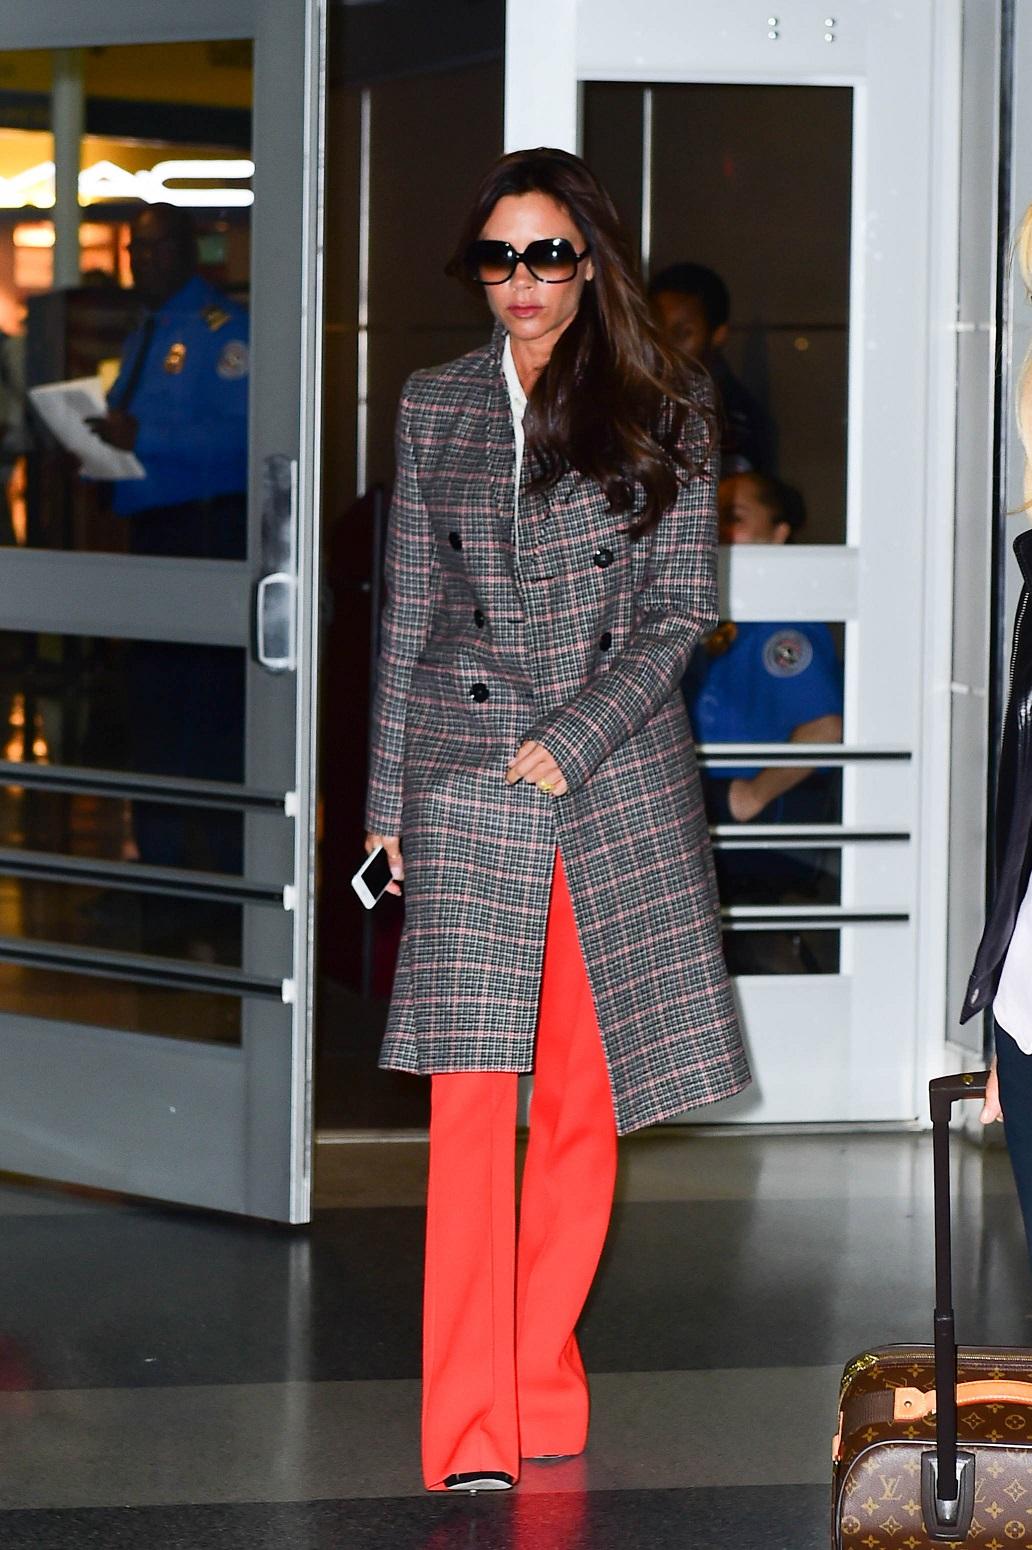 World's best dressed travellers: Victoria Beckham, Amal